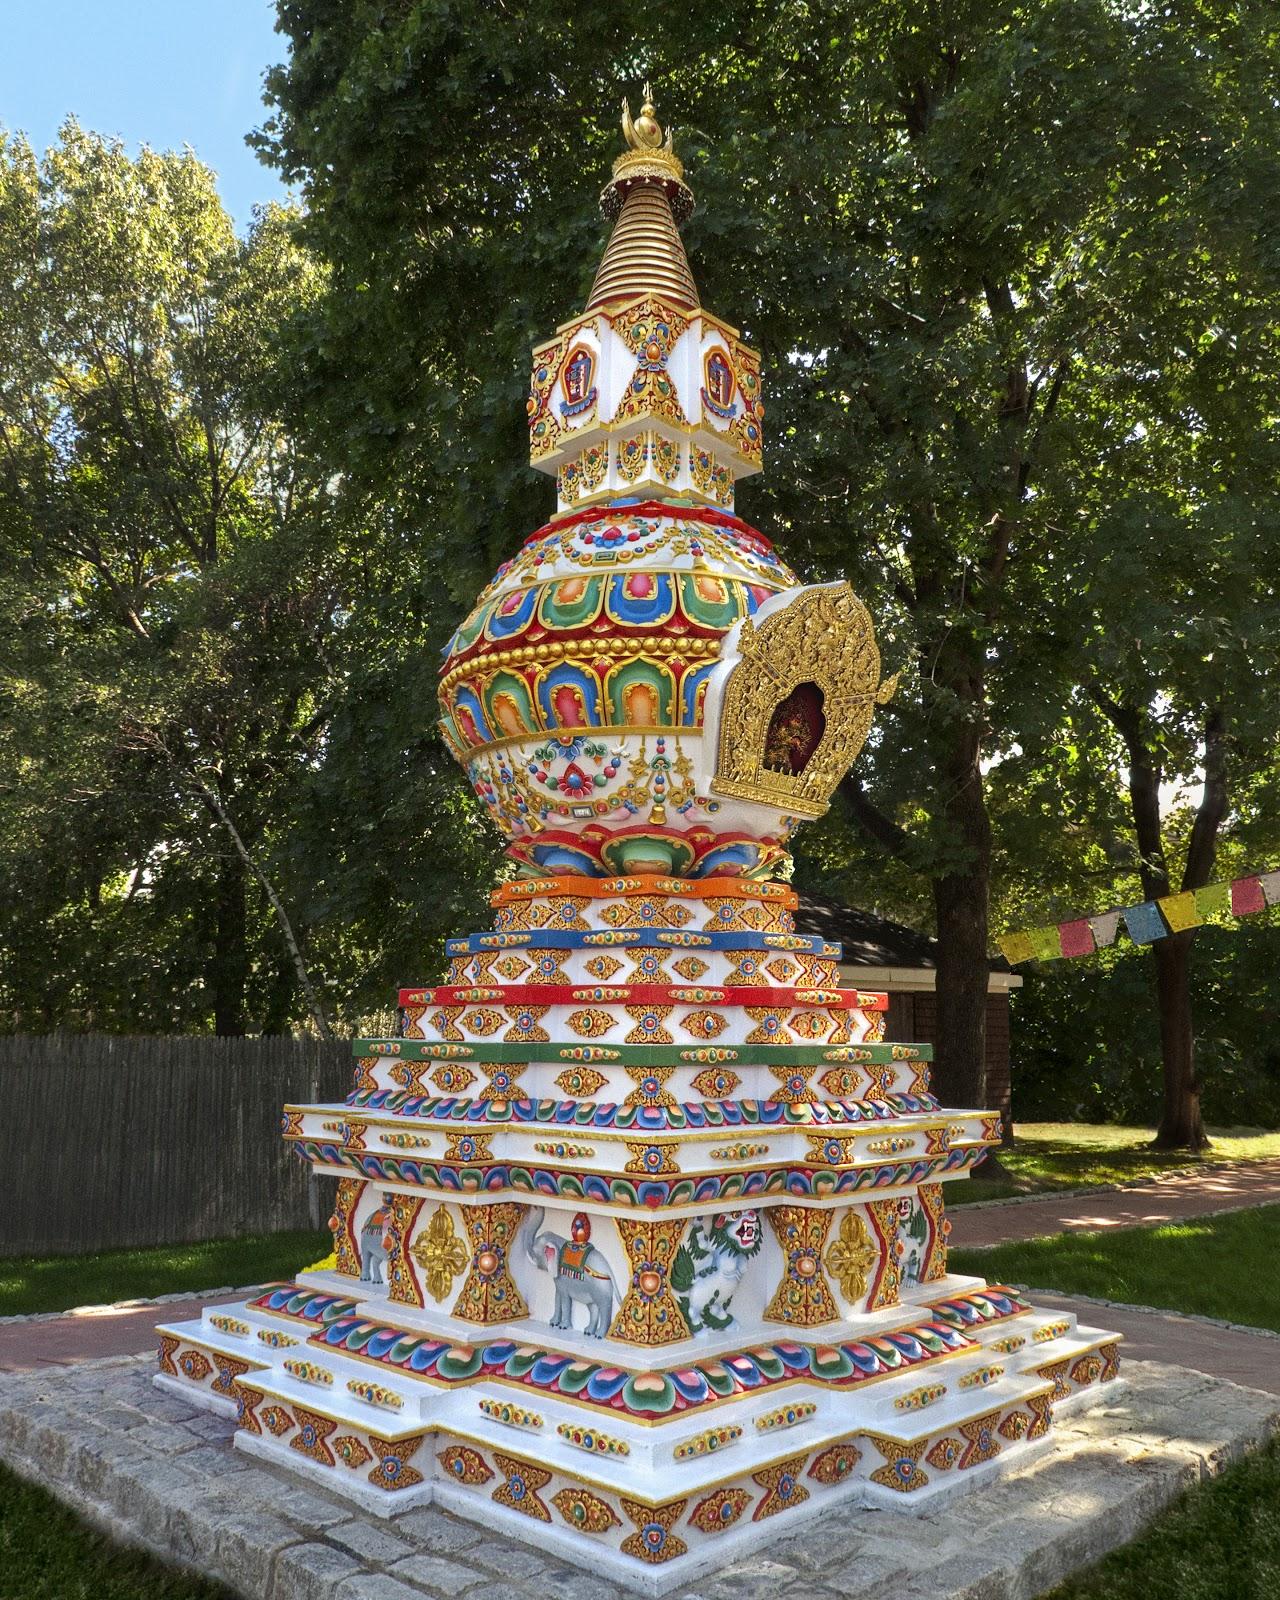 Making offerings to wards the building of the Kalachakra stupa at Kurukulla Center